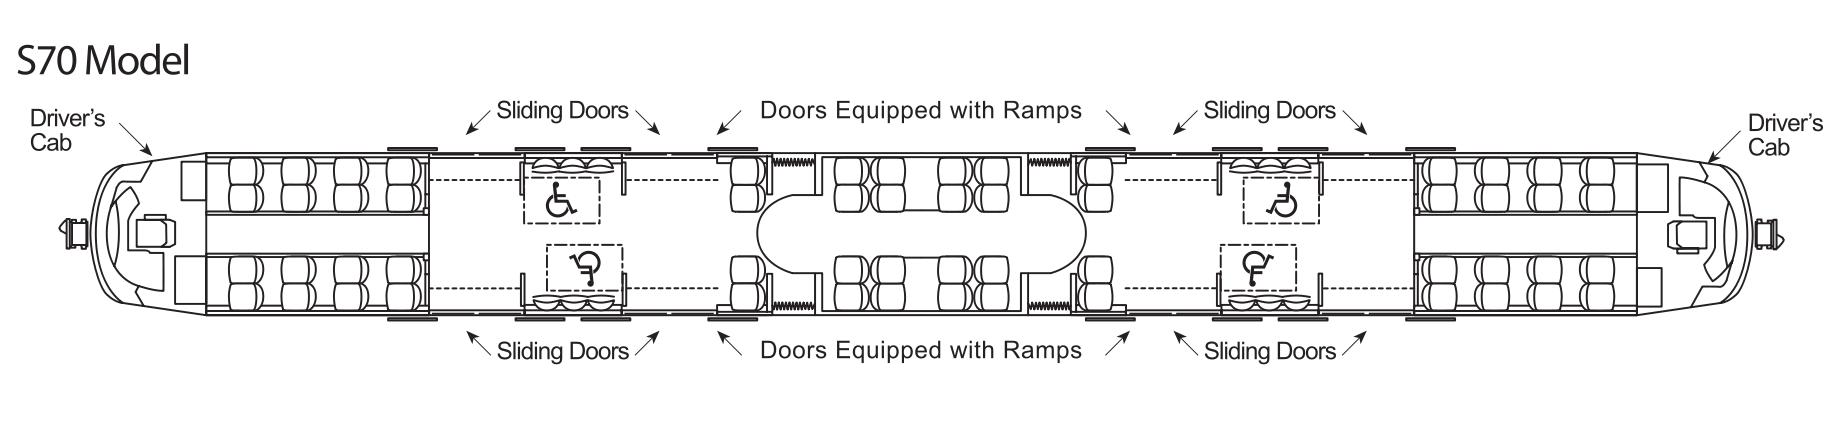 Siemens S70 diagram